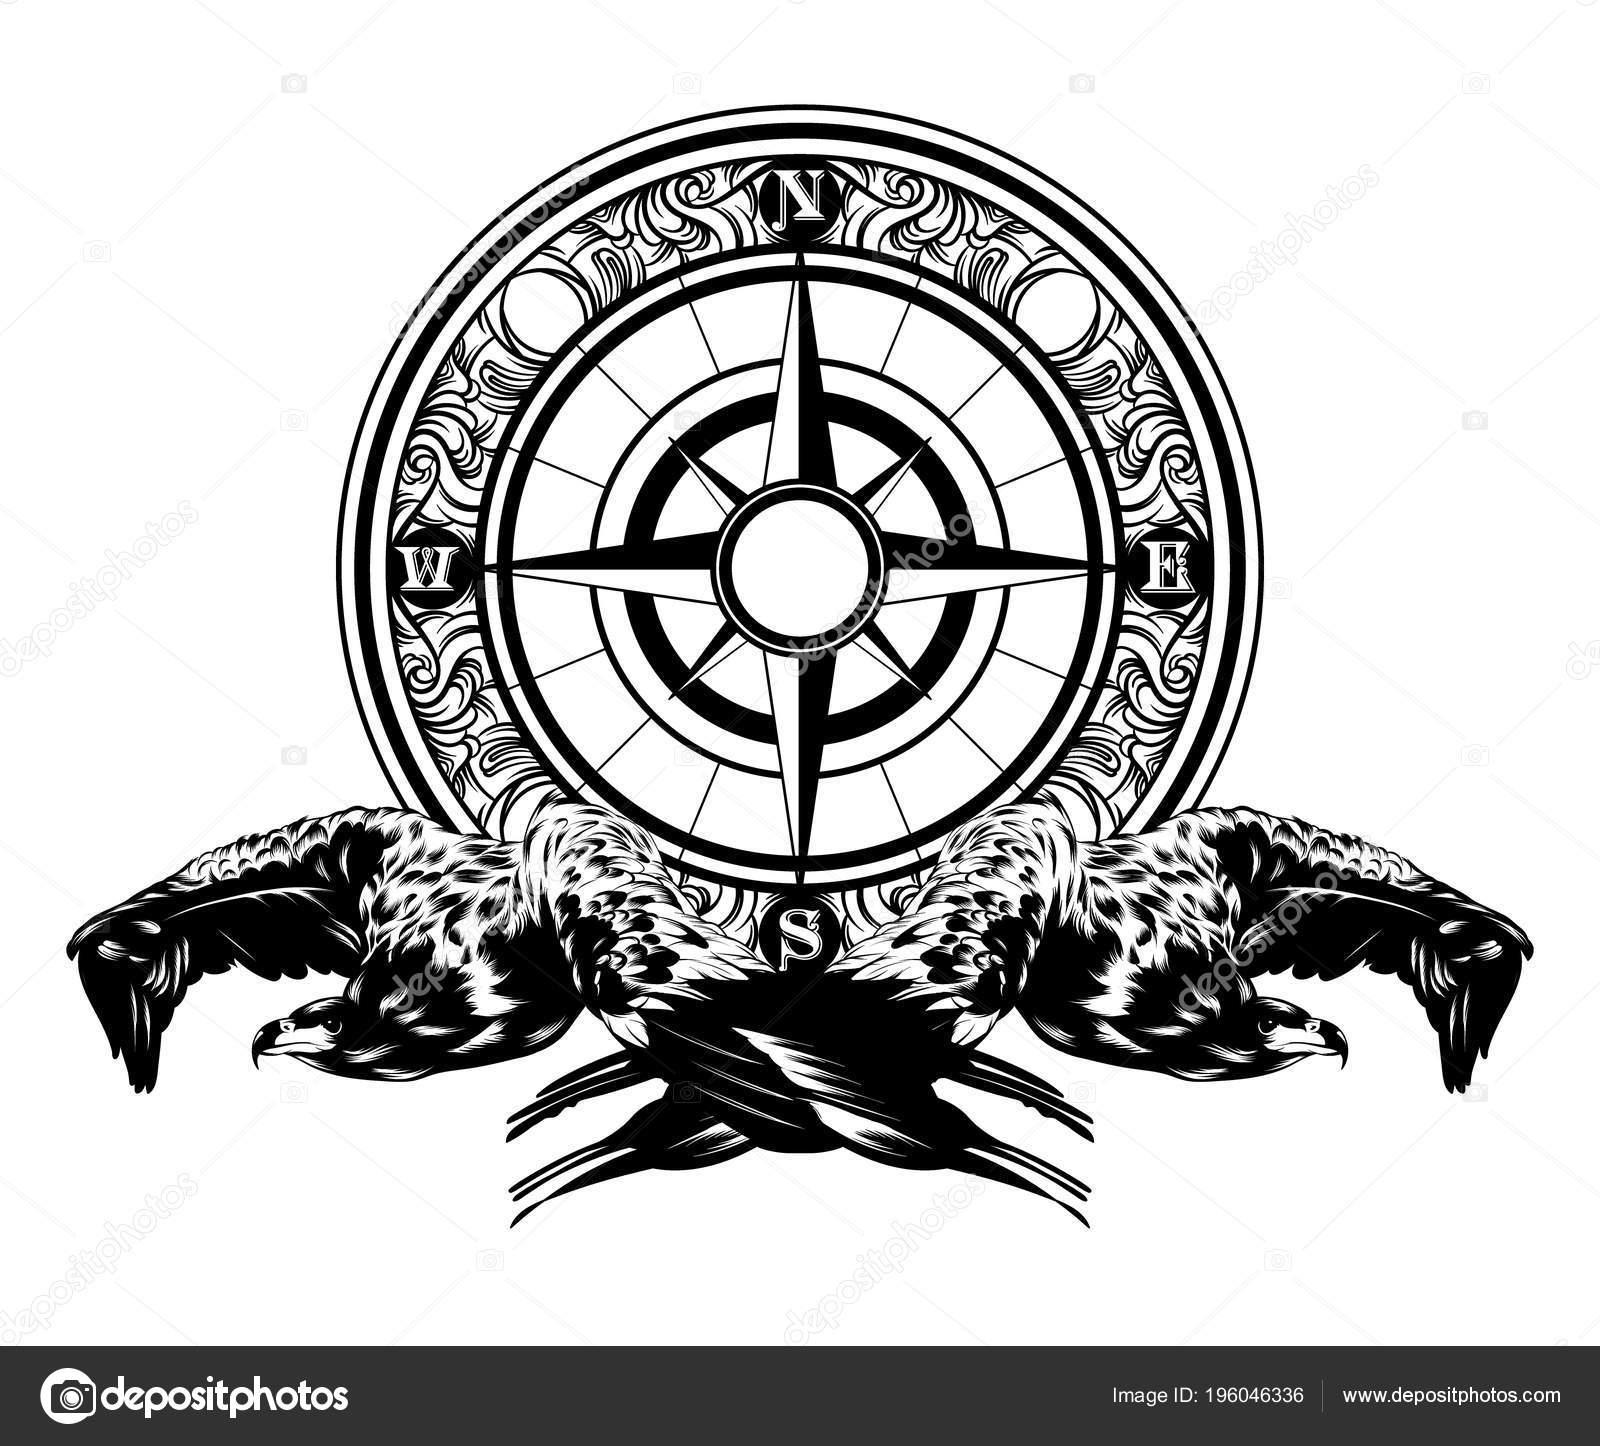 Rucne Kreslenou Vektorove Ilustrace Orel Kompas Samostatny